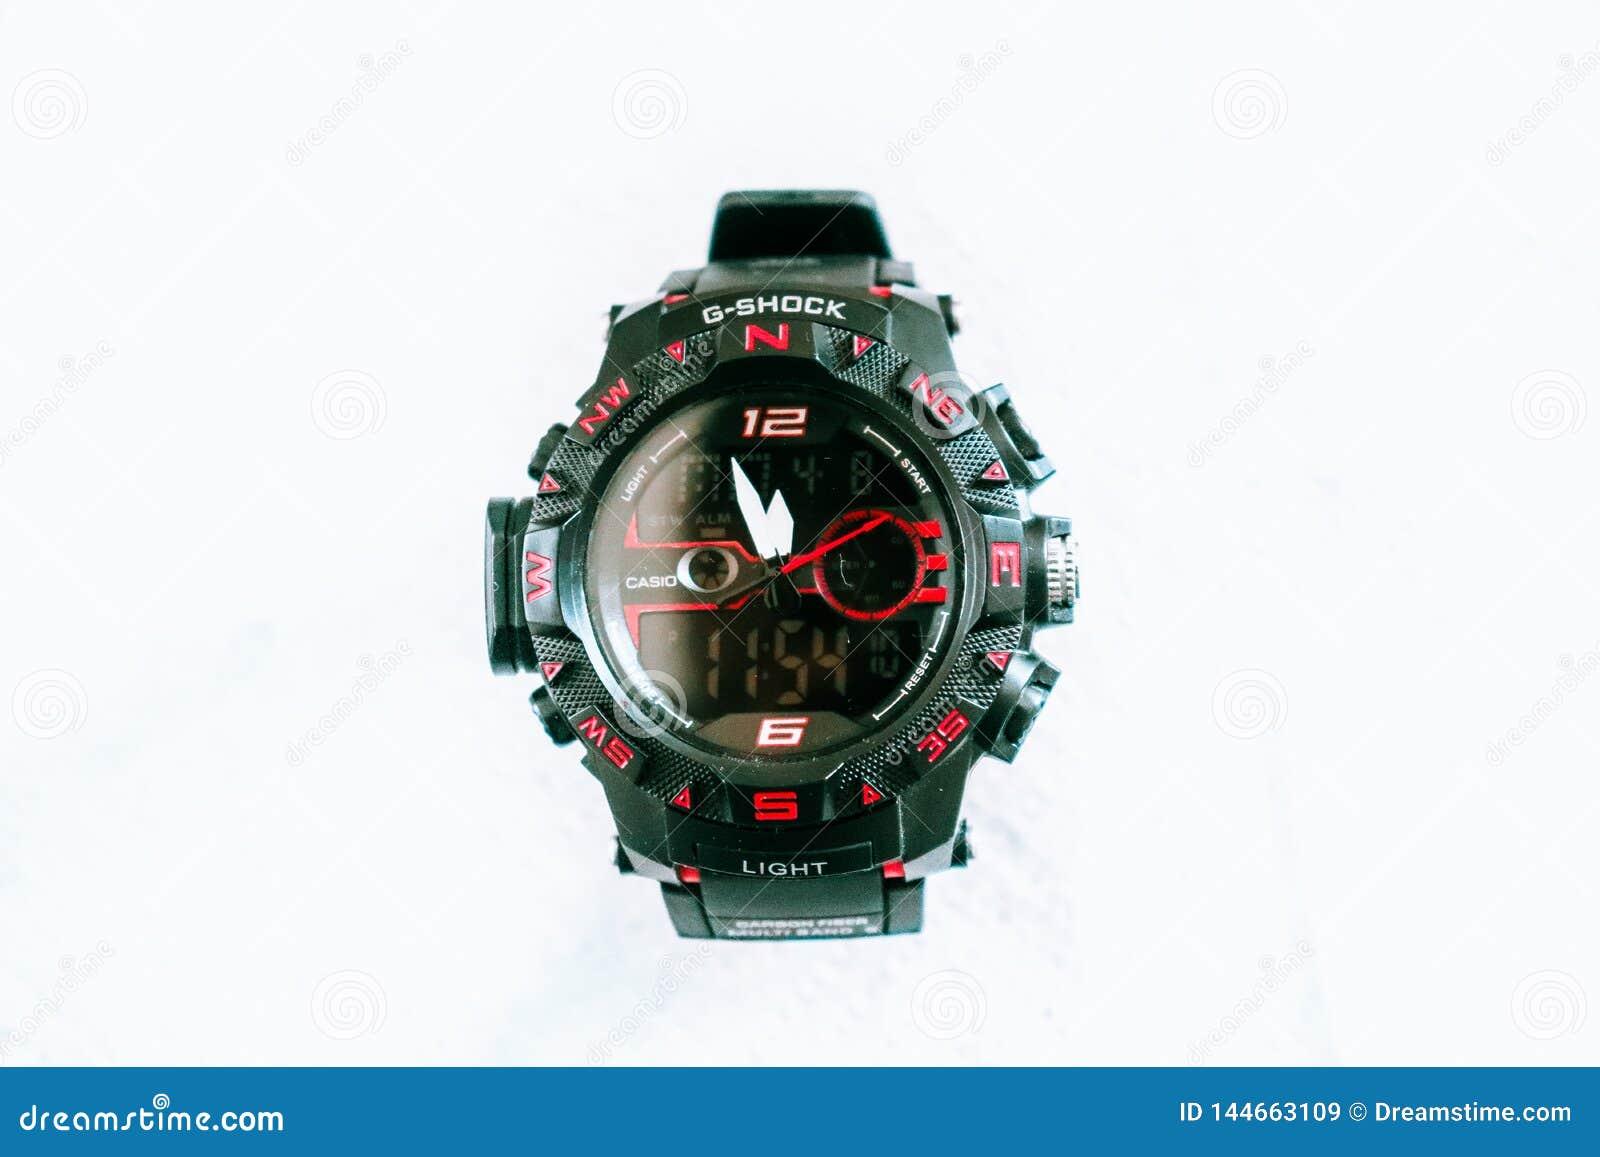 G_shock wrist watch